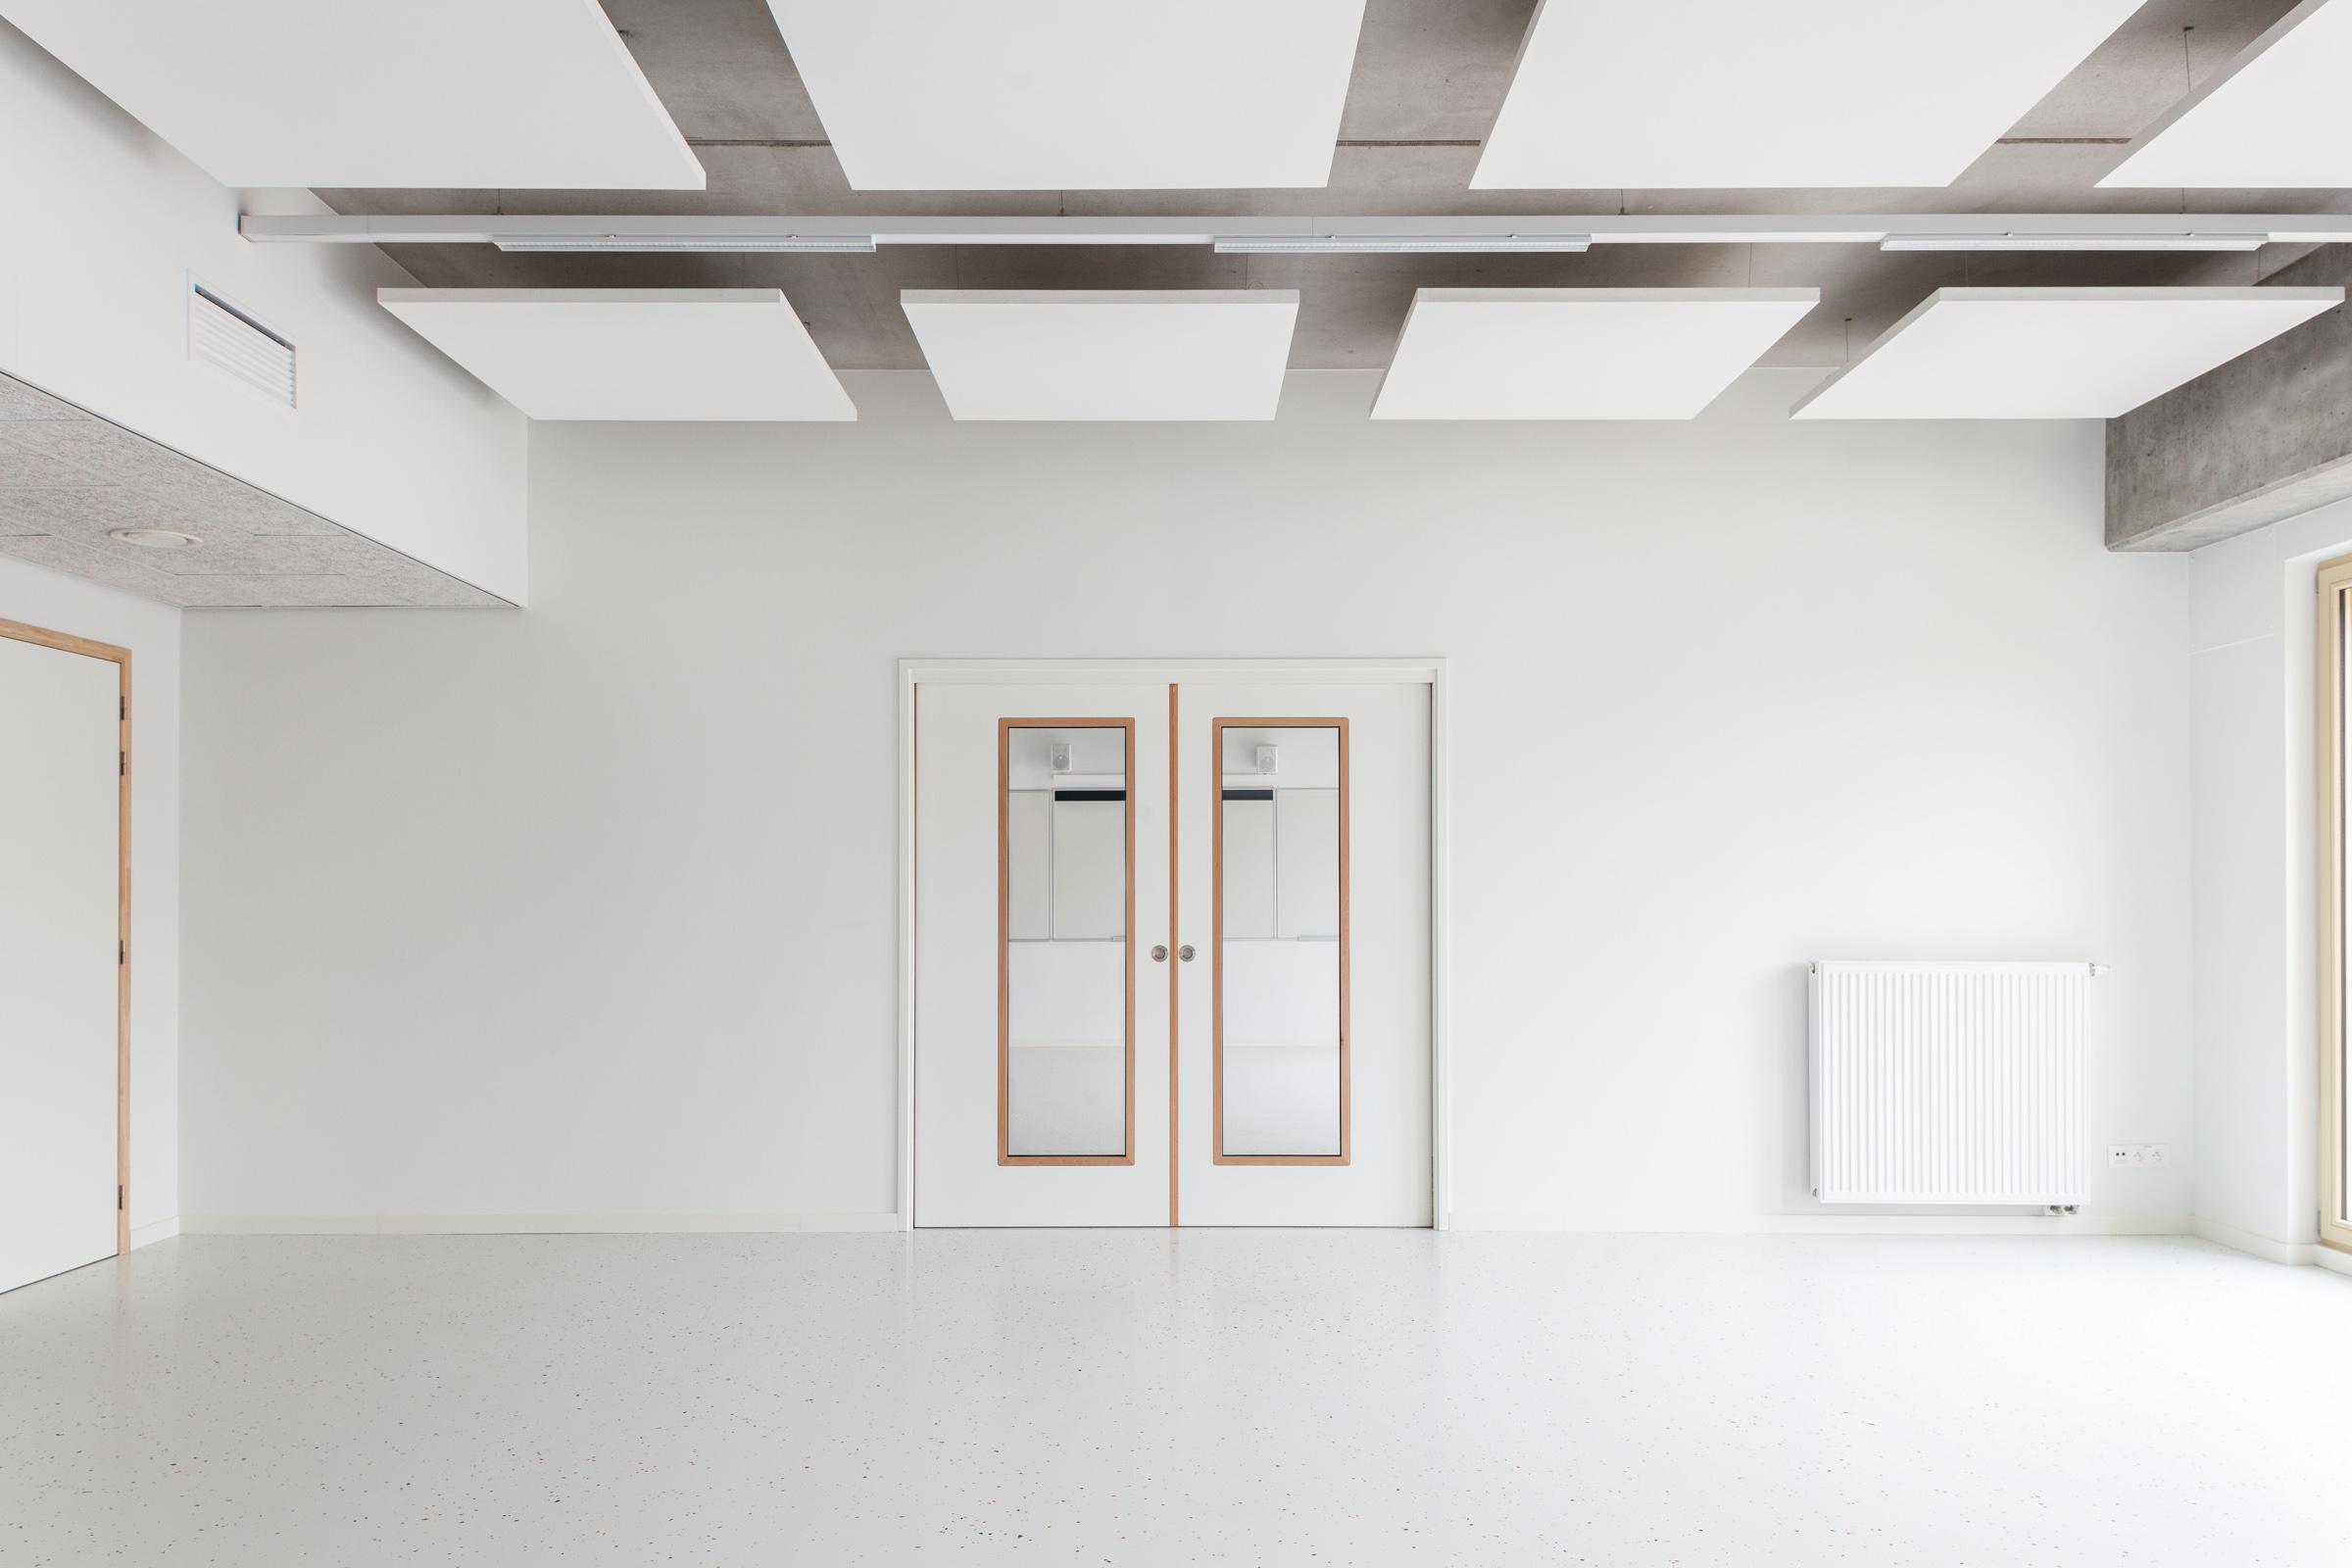 Windekind shot for OSK-AR architecten